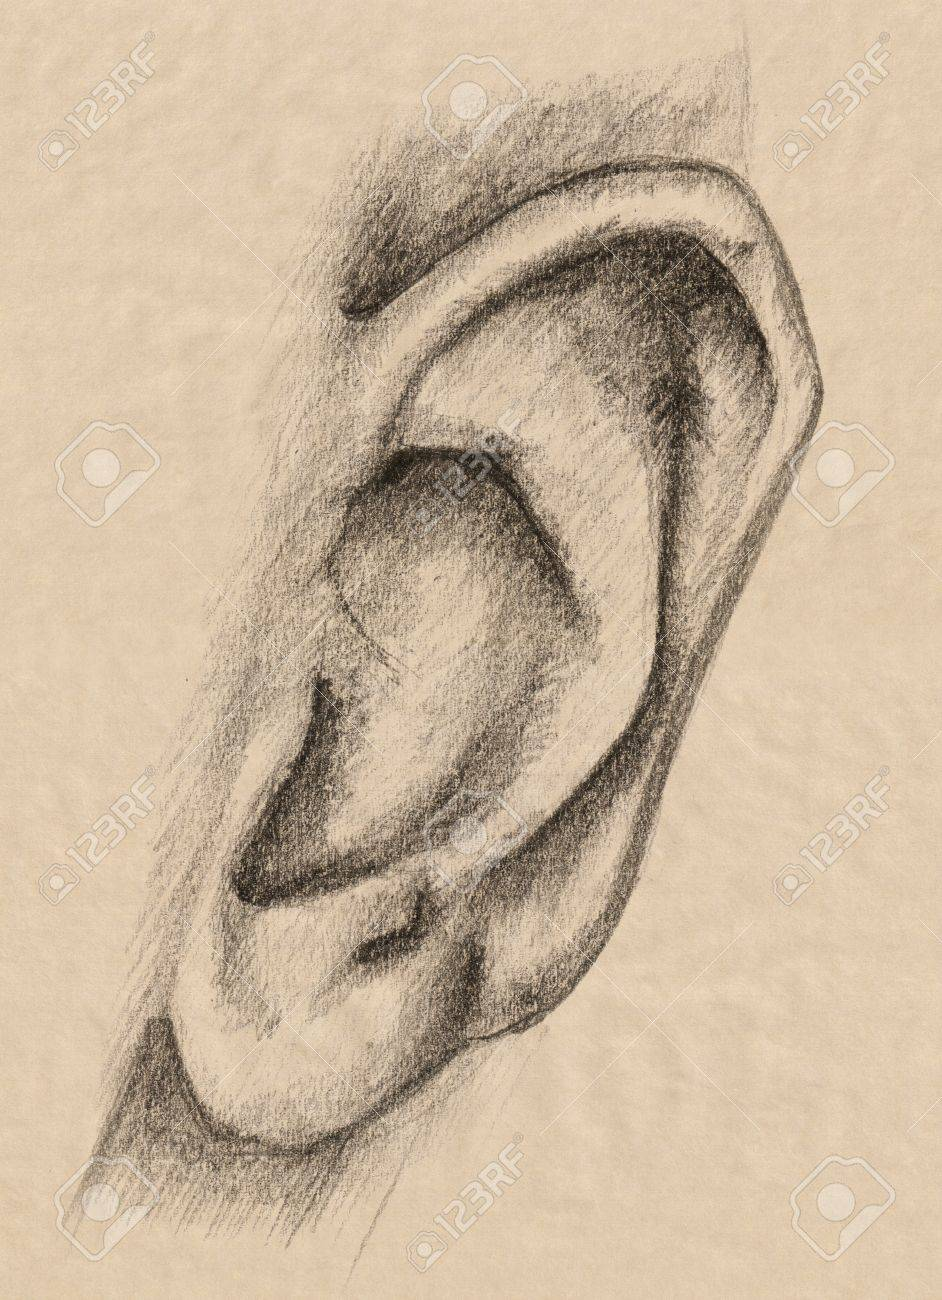 human ear drawing at getdrawings com free for personal use human rh getdrawings com